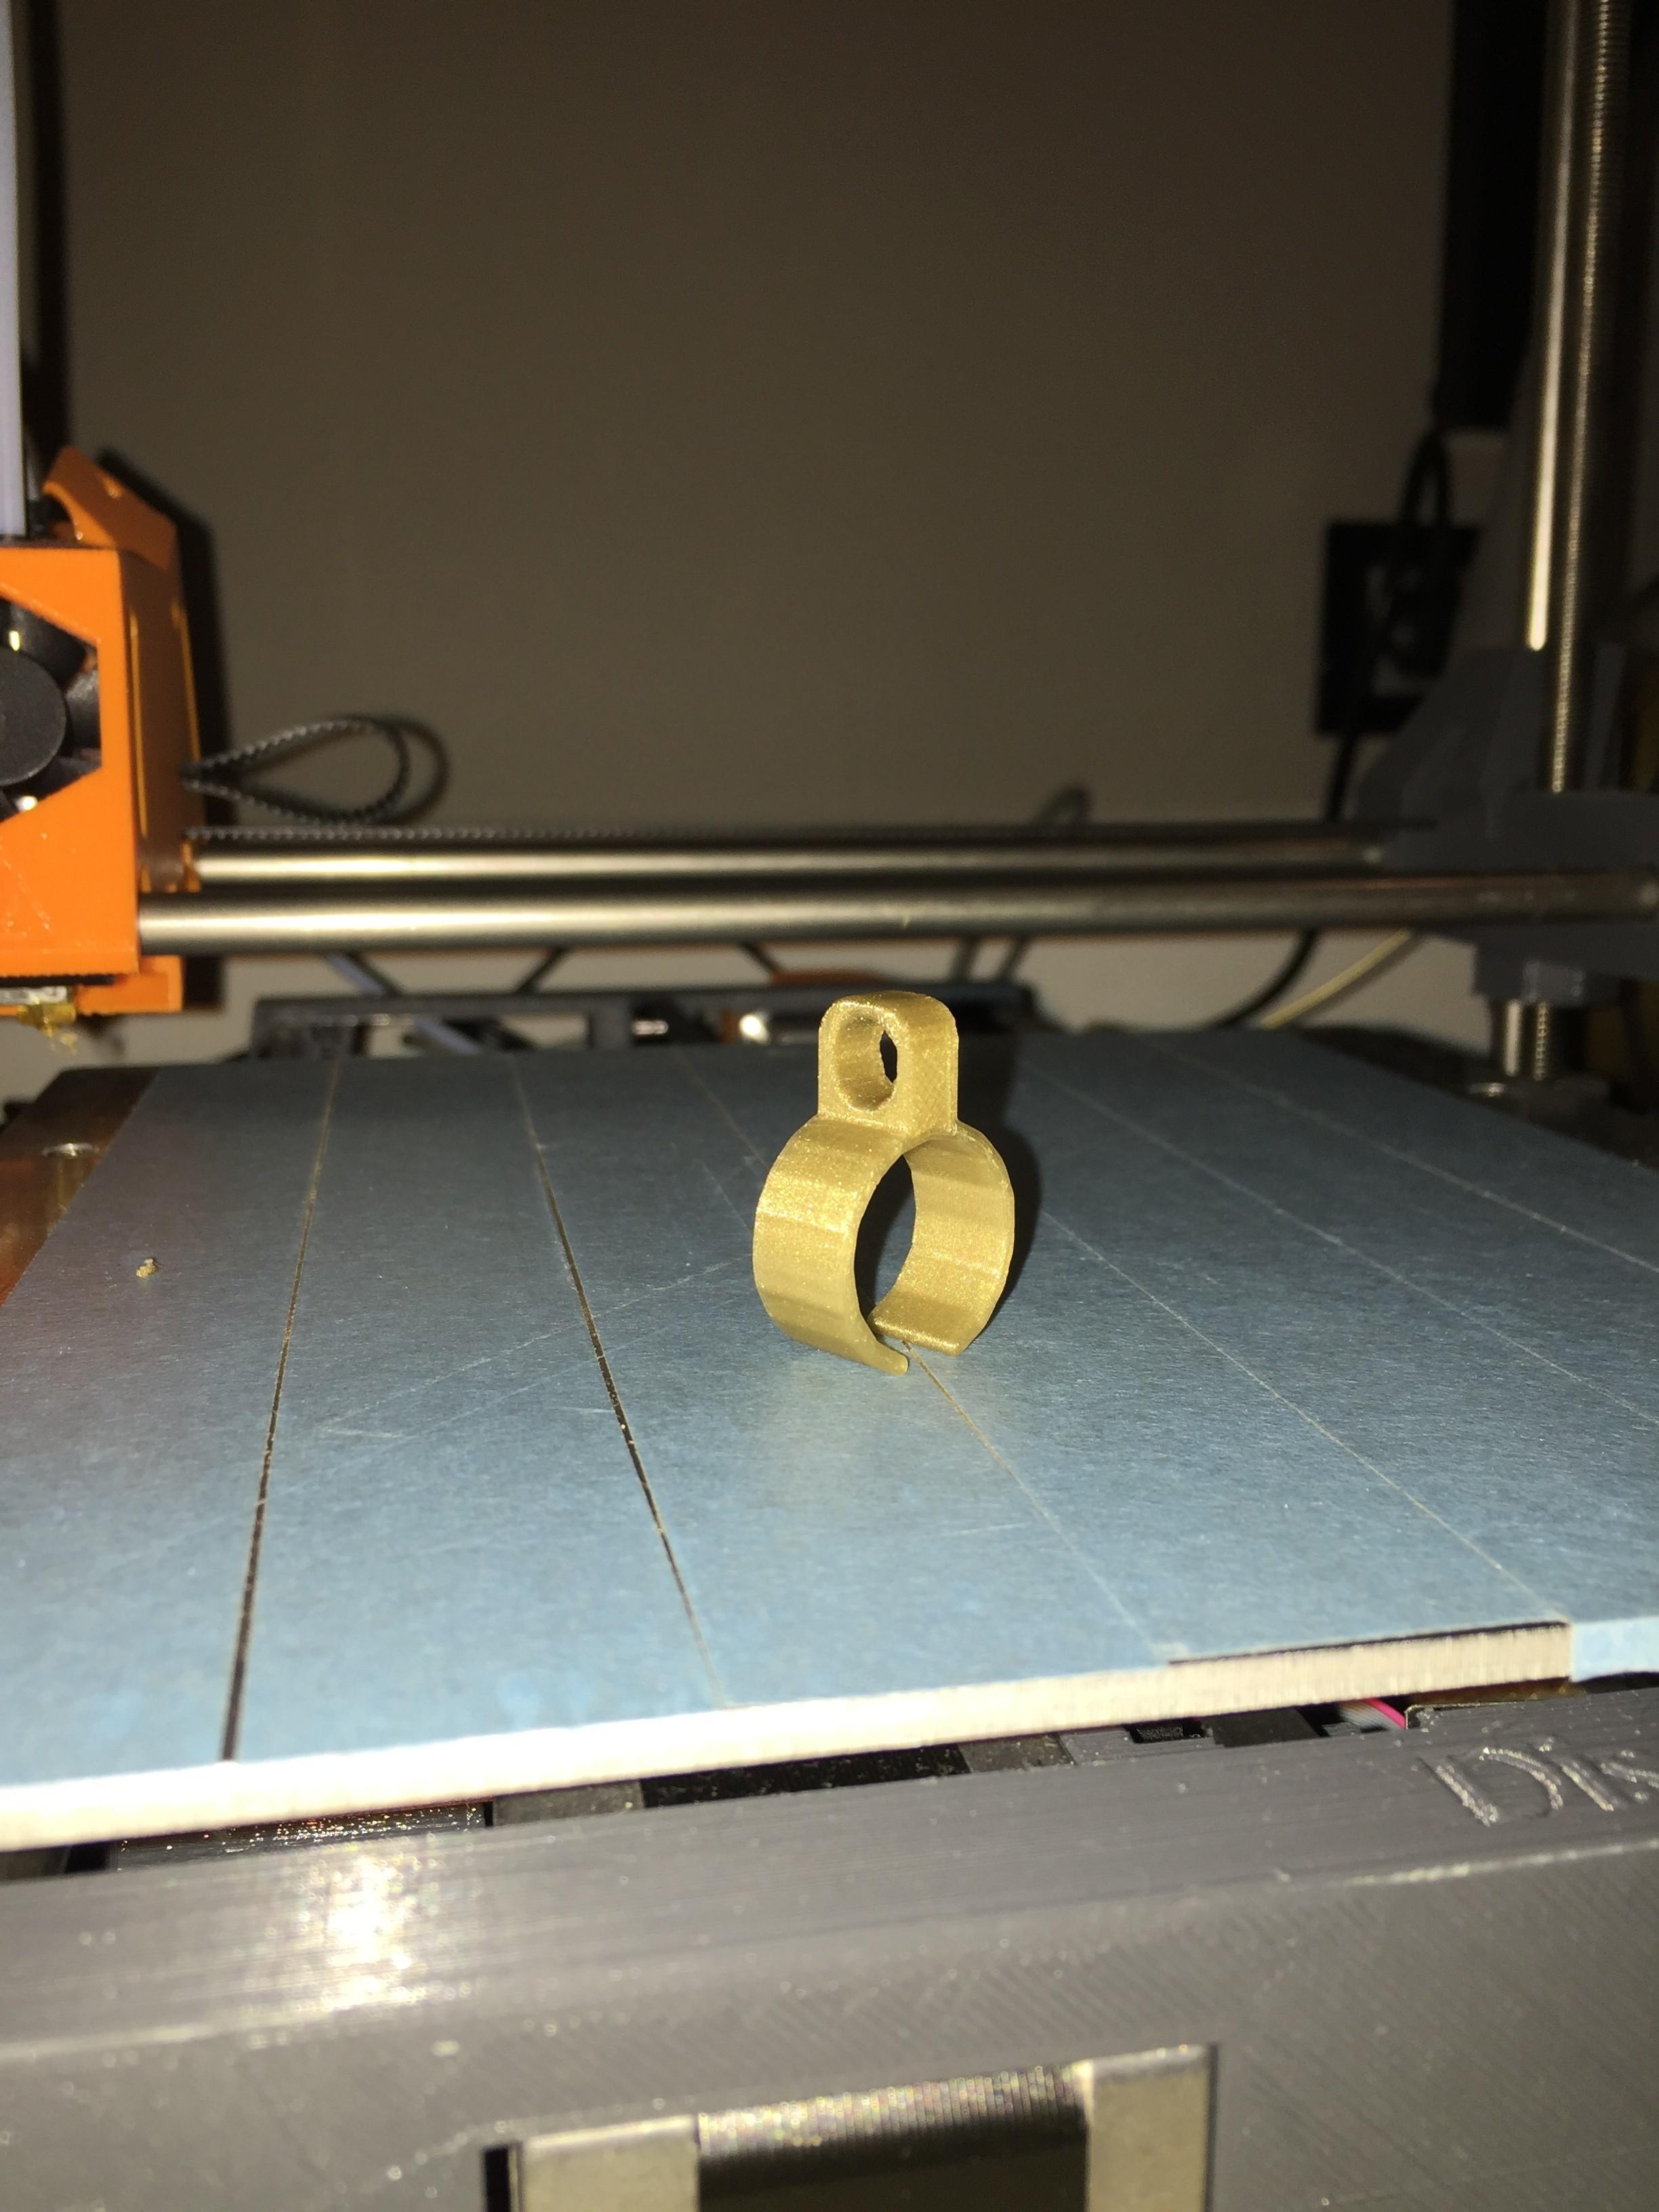 IMG_5286.JPG Download free STL file Ring - cigarette • 3D printer model, mikit36